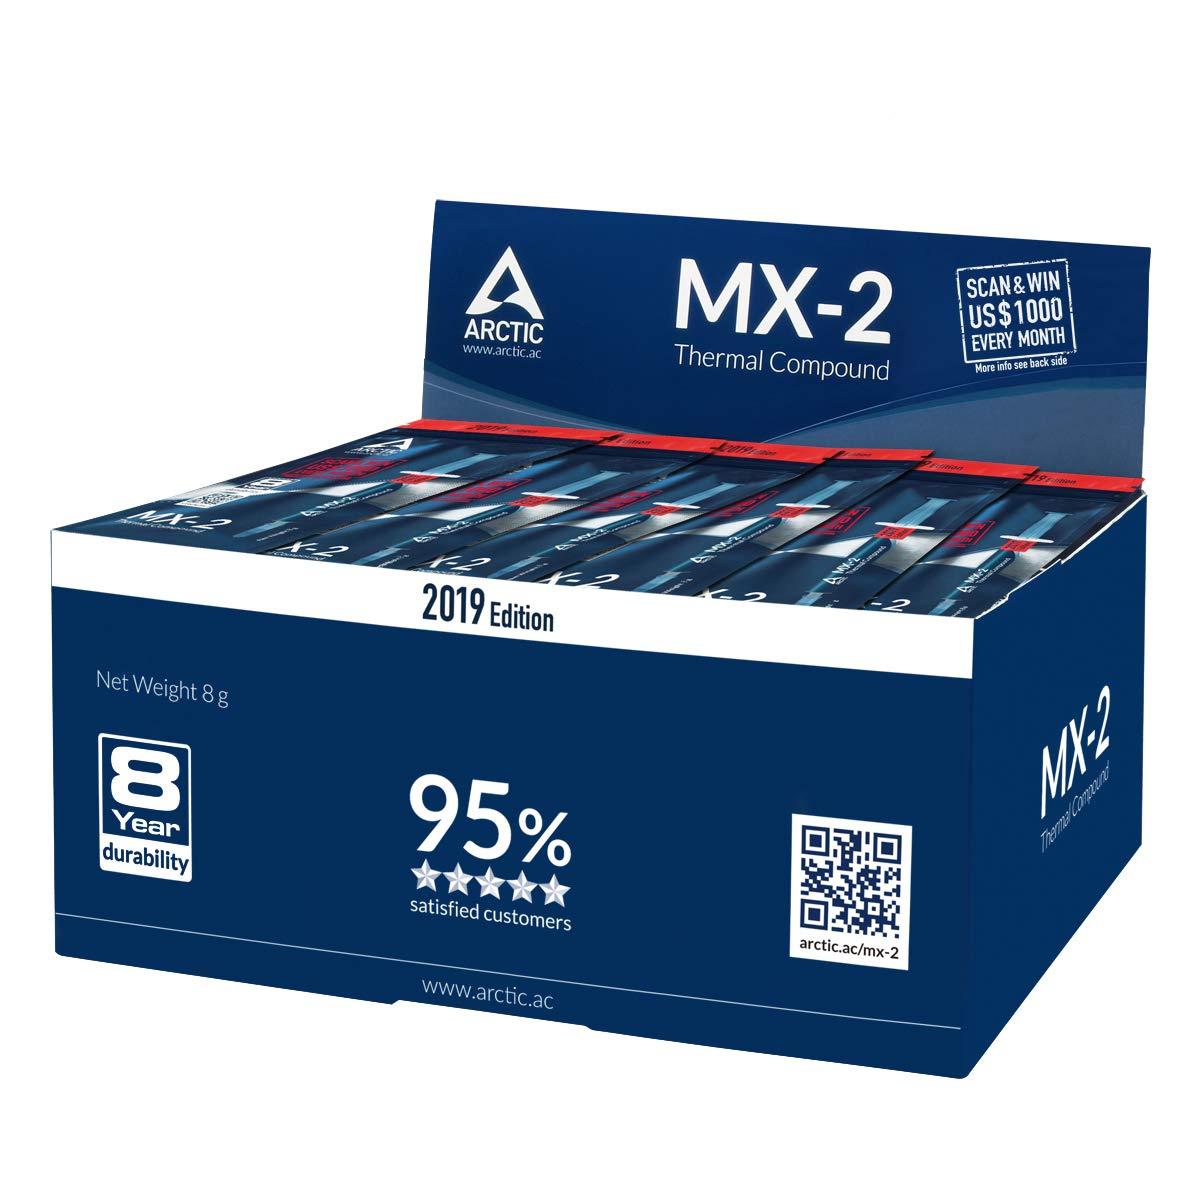 ARCTIC MX-2 Edition 2019 - Pasta de interfaz térmica a base de carbono - Disipador de calor - Fácil de aplicar - alta durabilidad - 8g: Amazon.es: ...